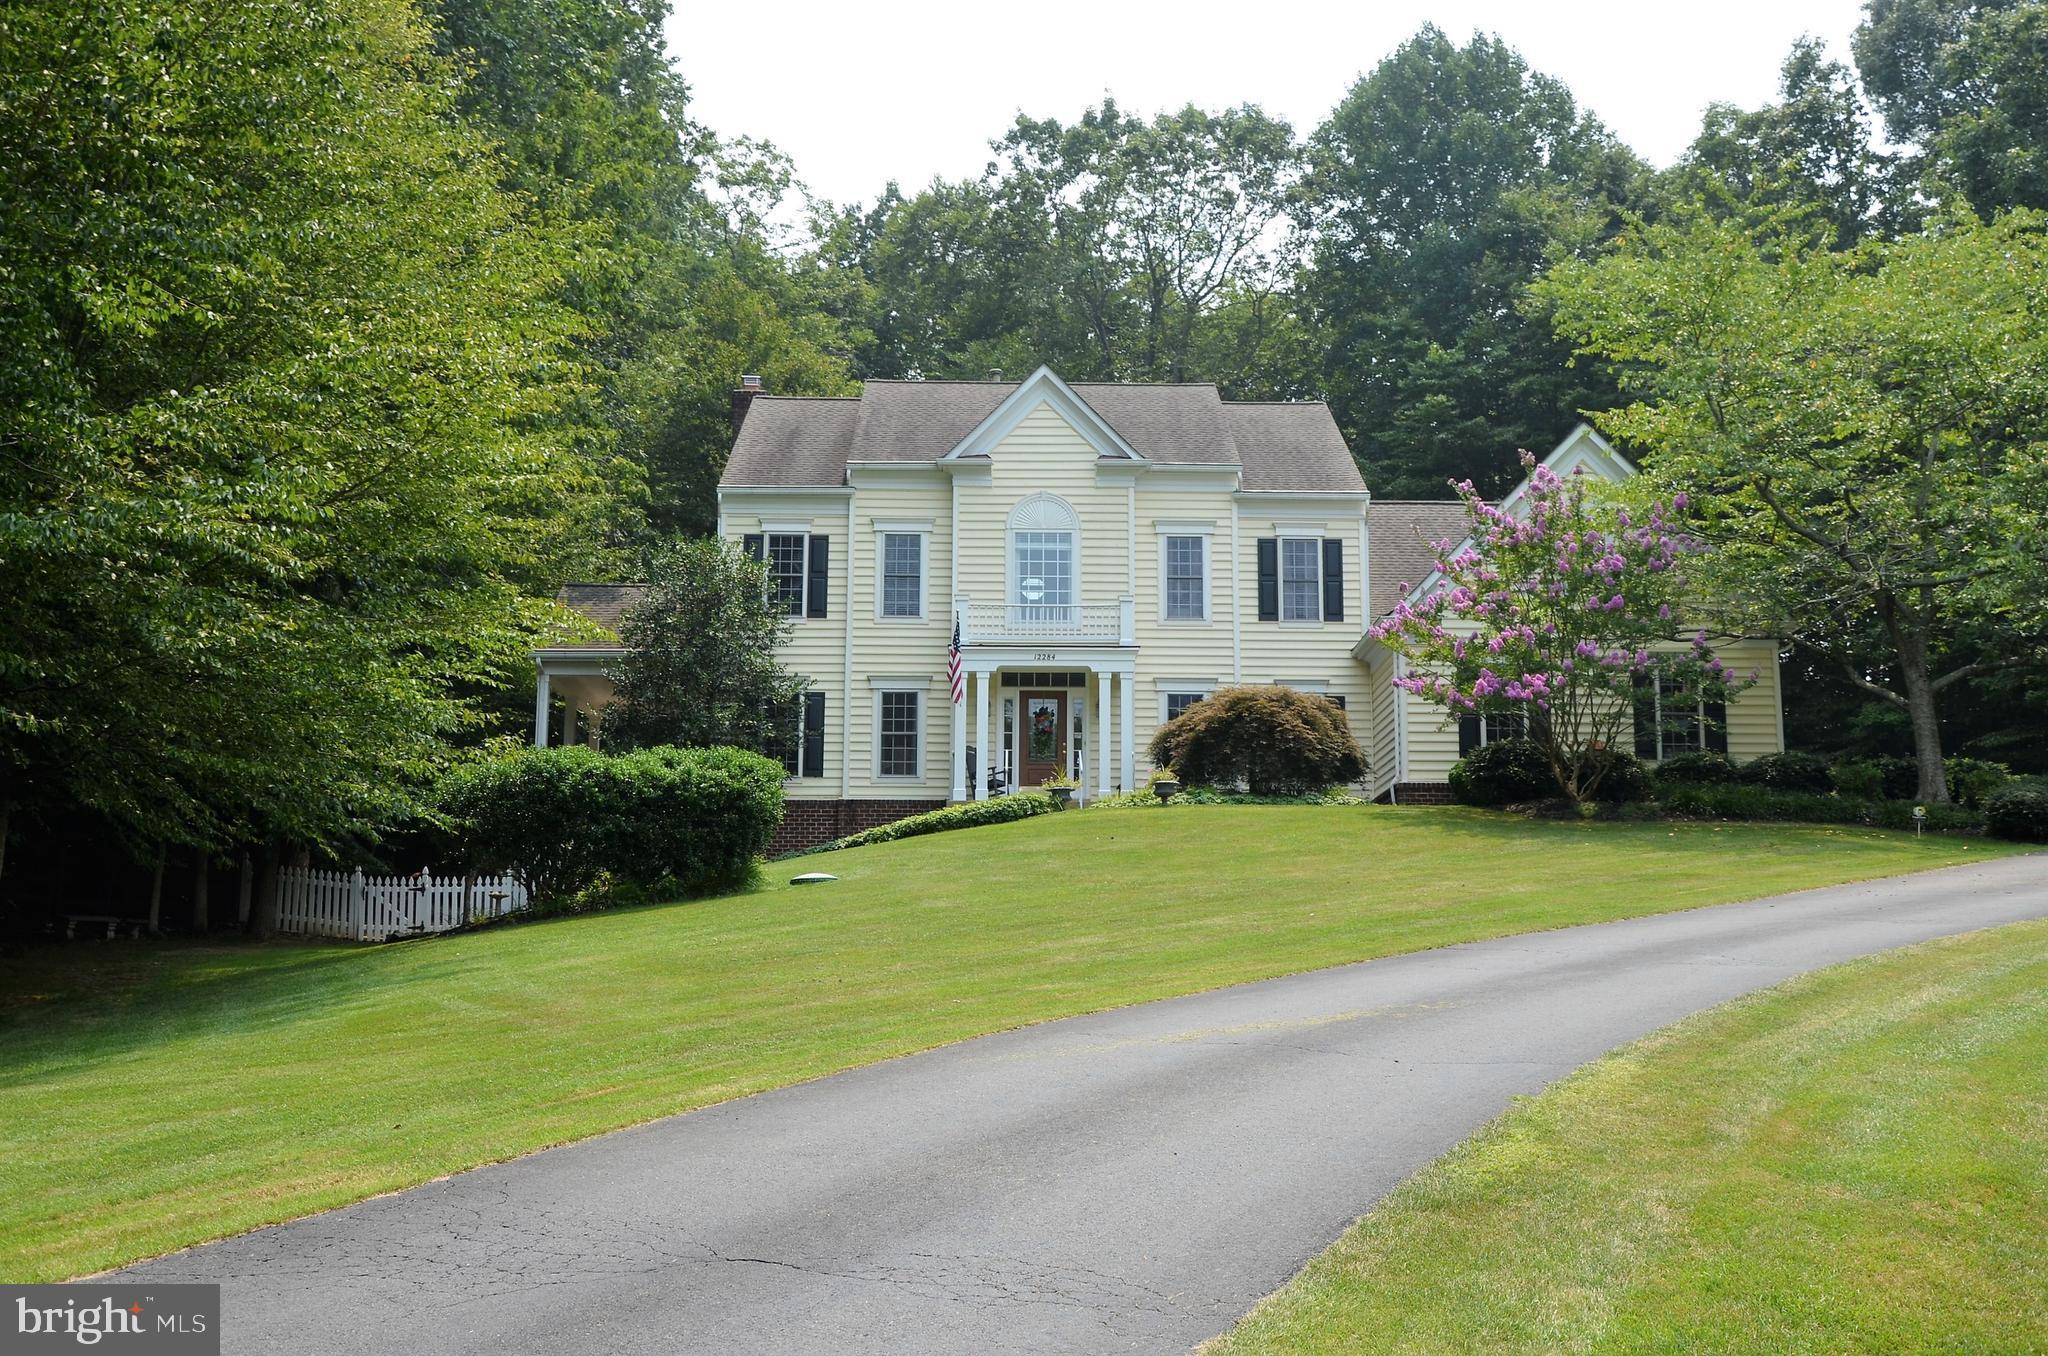 Fantastic upscale home in distinguished neighborhood of Hunter's Ridge /Treywood.  This executive ho